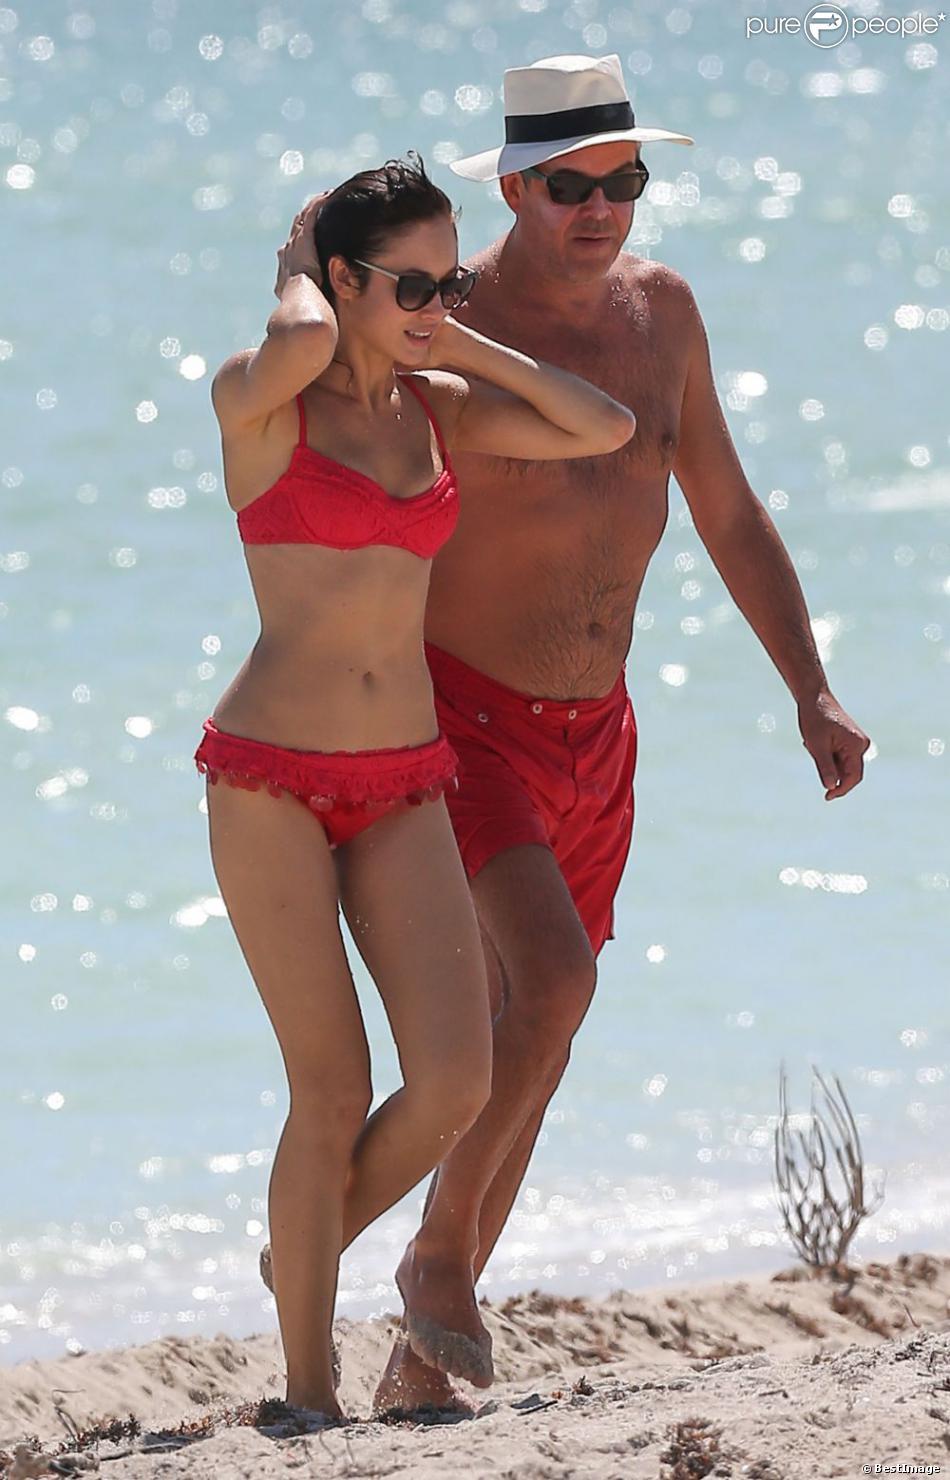 La très sexy Olga Kurylenko et son compagnon Danny Huston à Miami, le 16 octobre 2012.